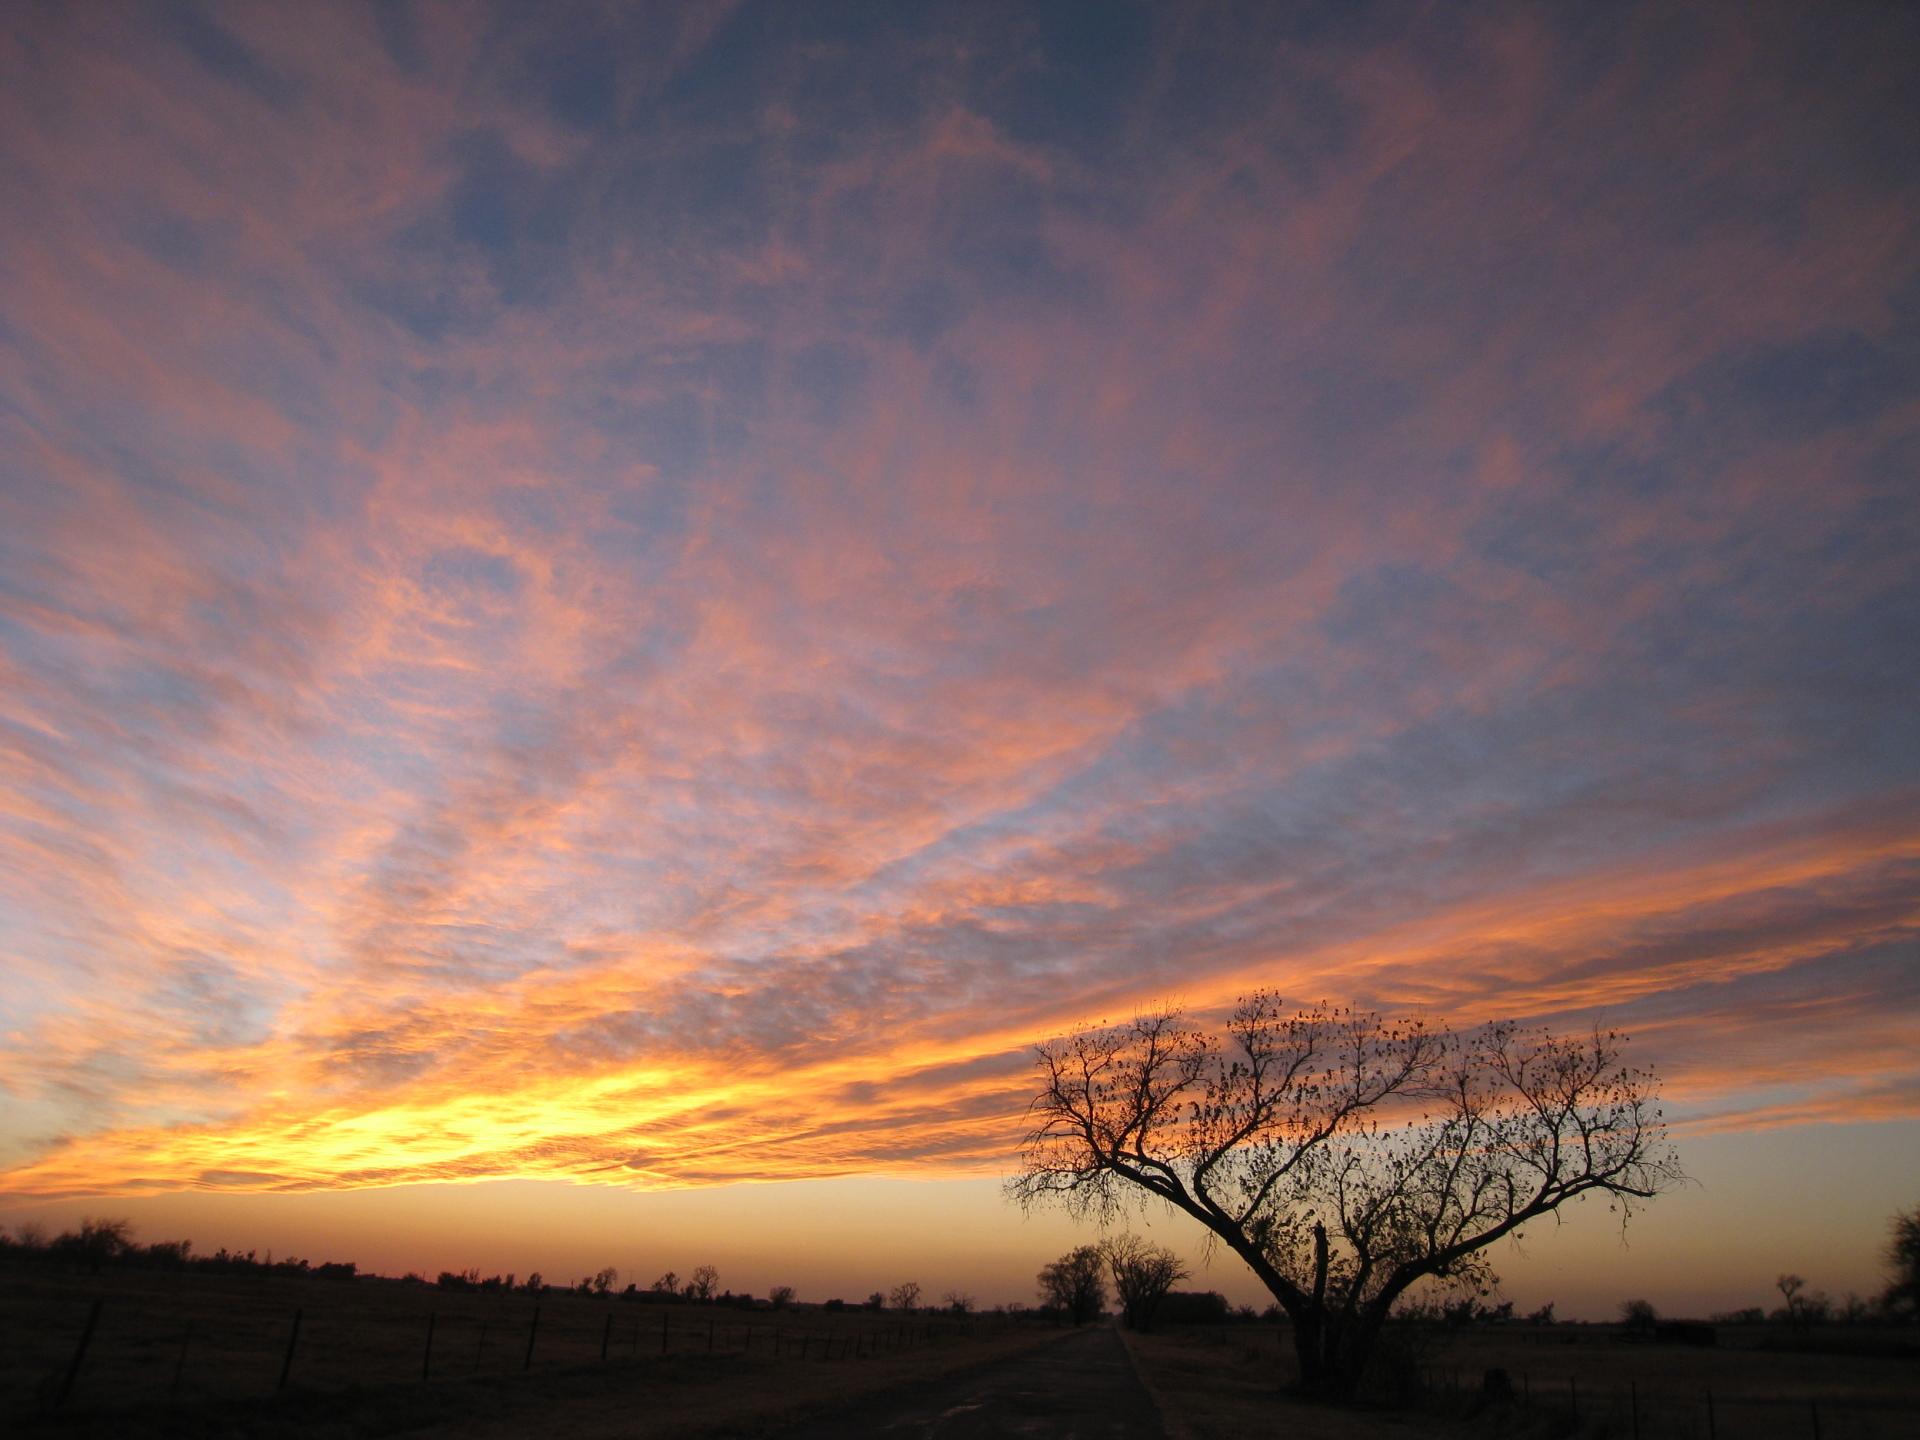 Oklahoma--November 2010